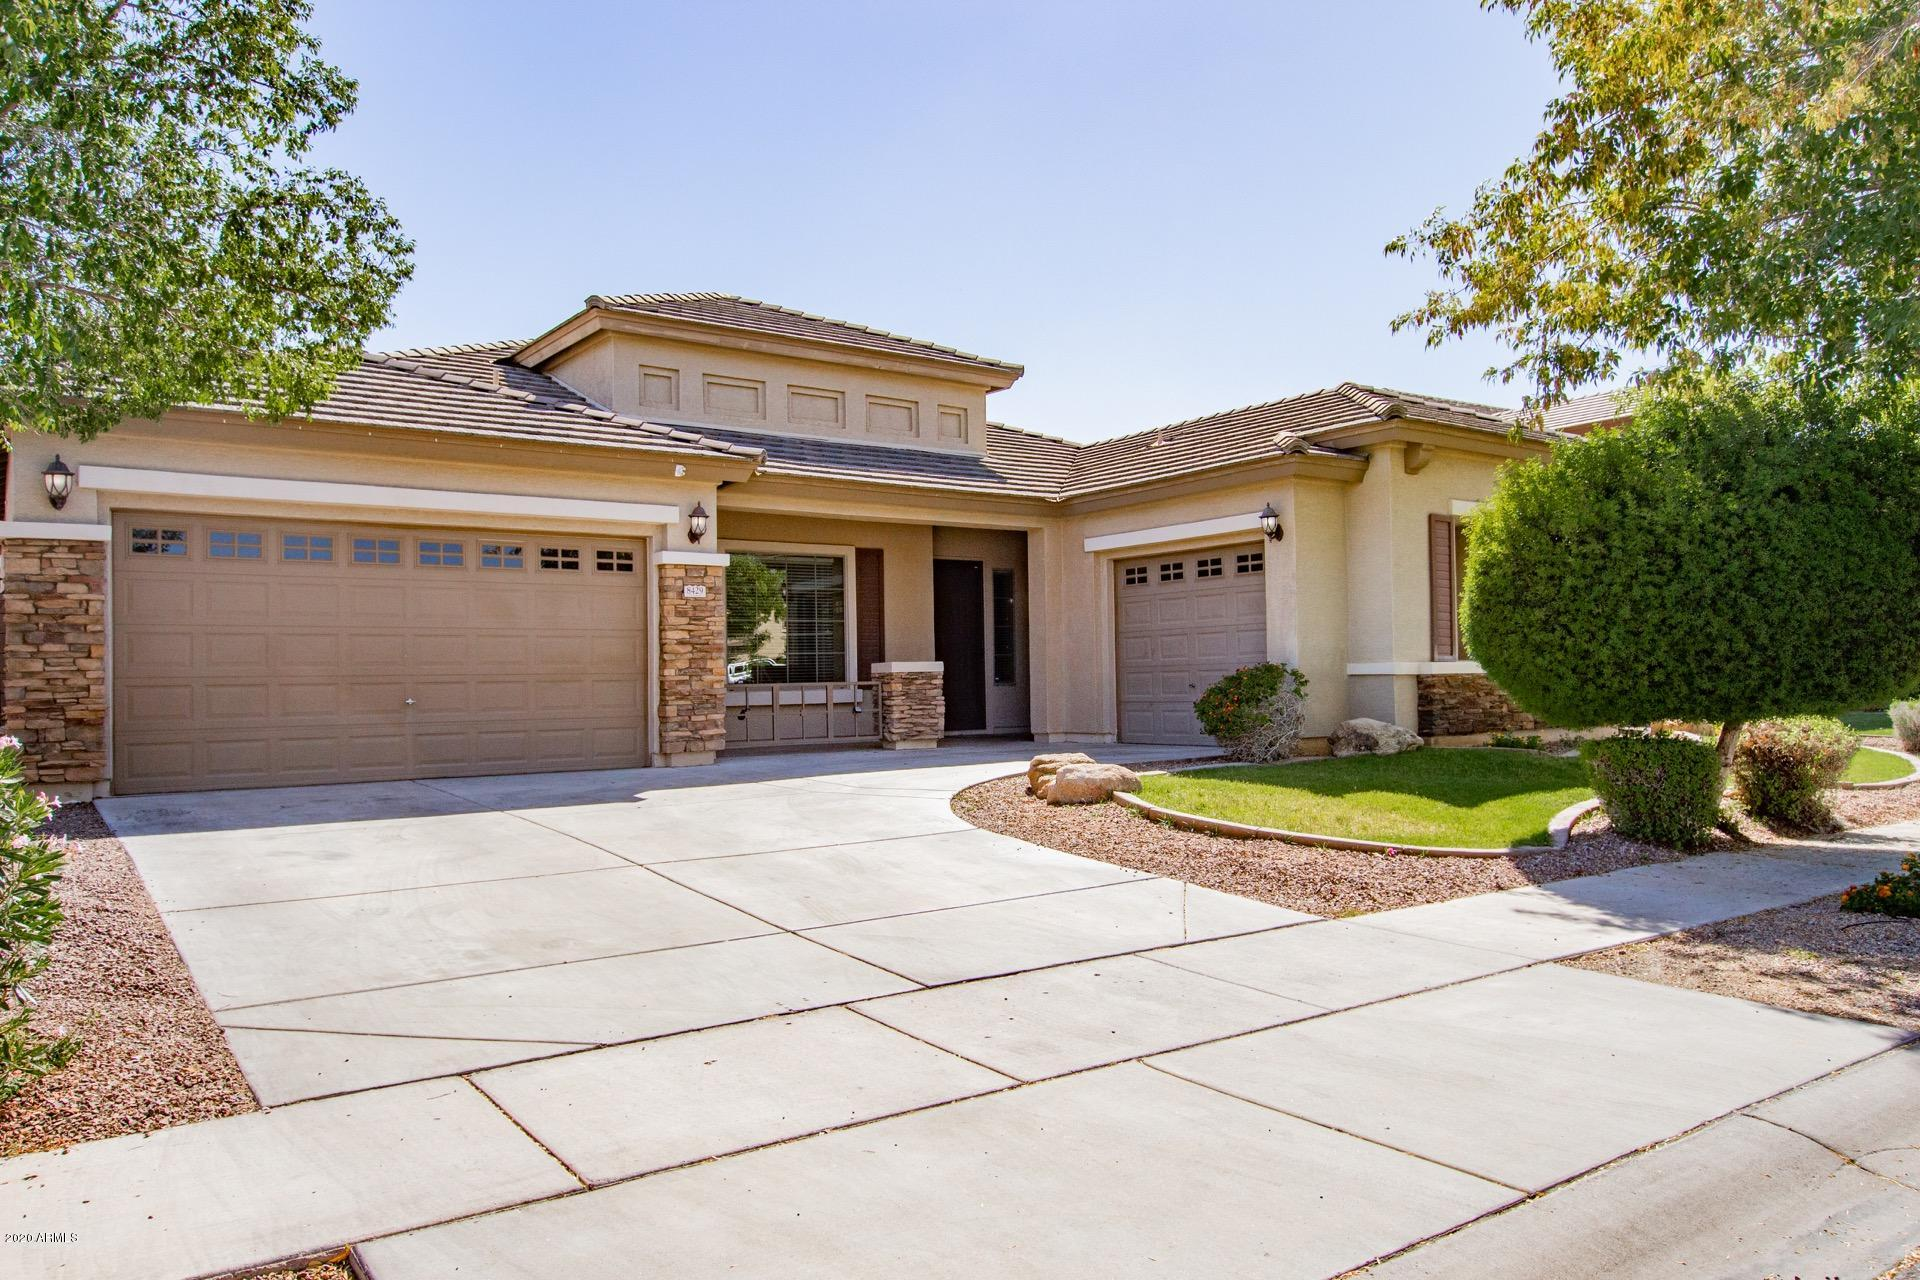 Photo of 8429 W NORTHVIEW Avenue, Glendale, AZ 85305